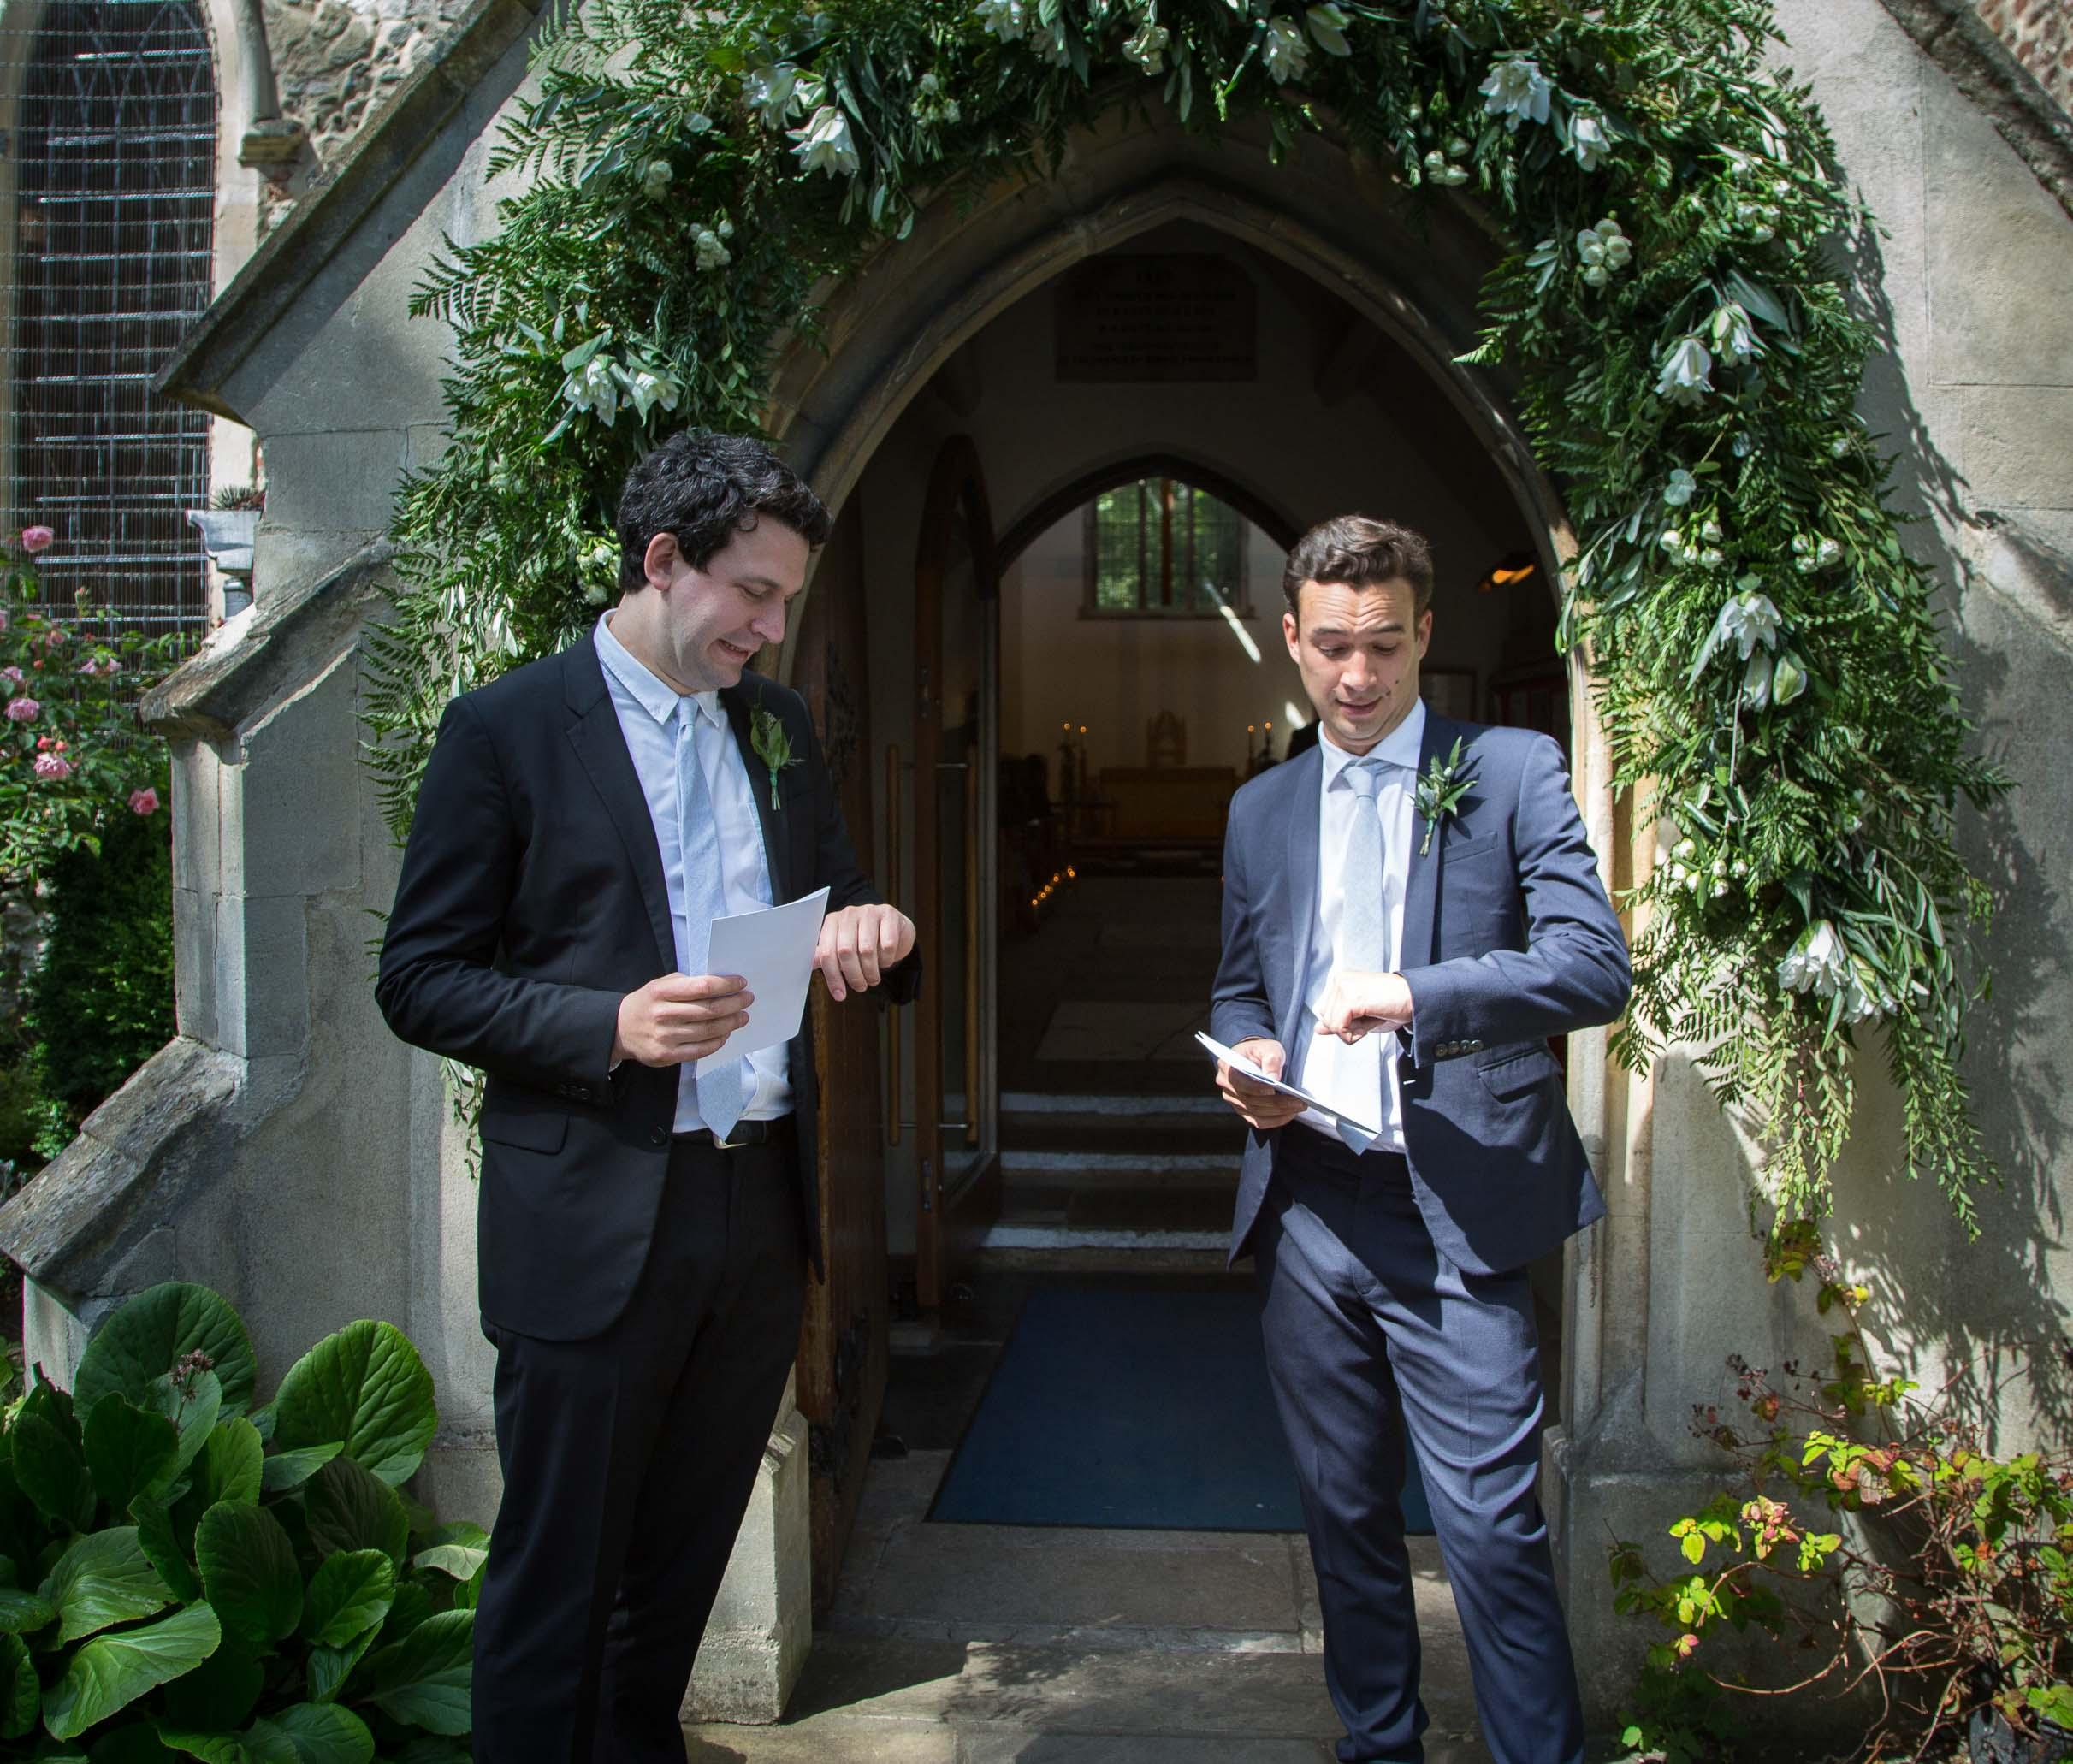 barnes-wedding-adam-rowley-photographer-groomsmen-late